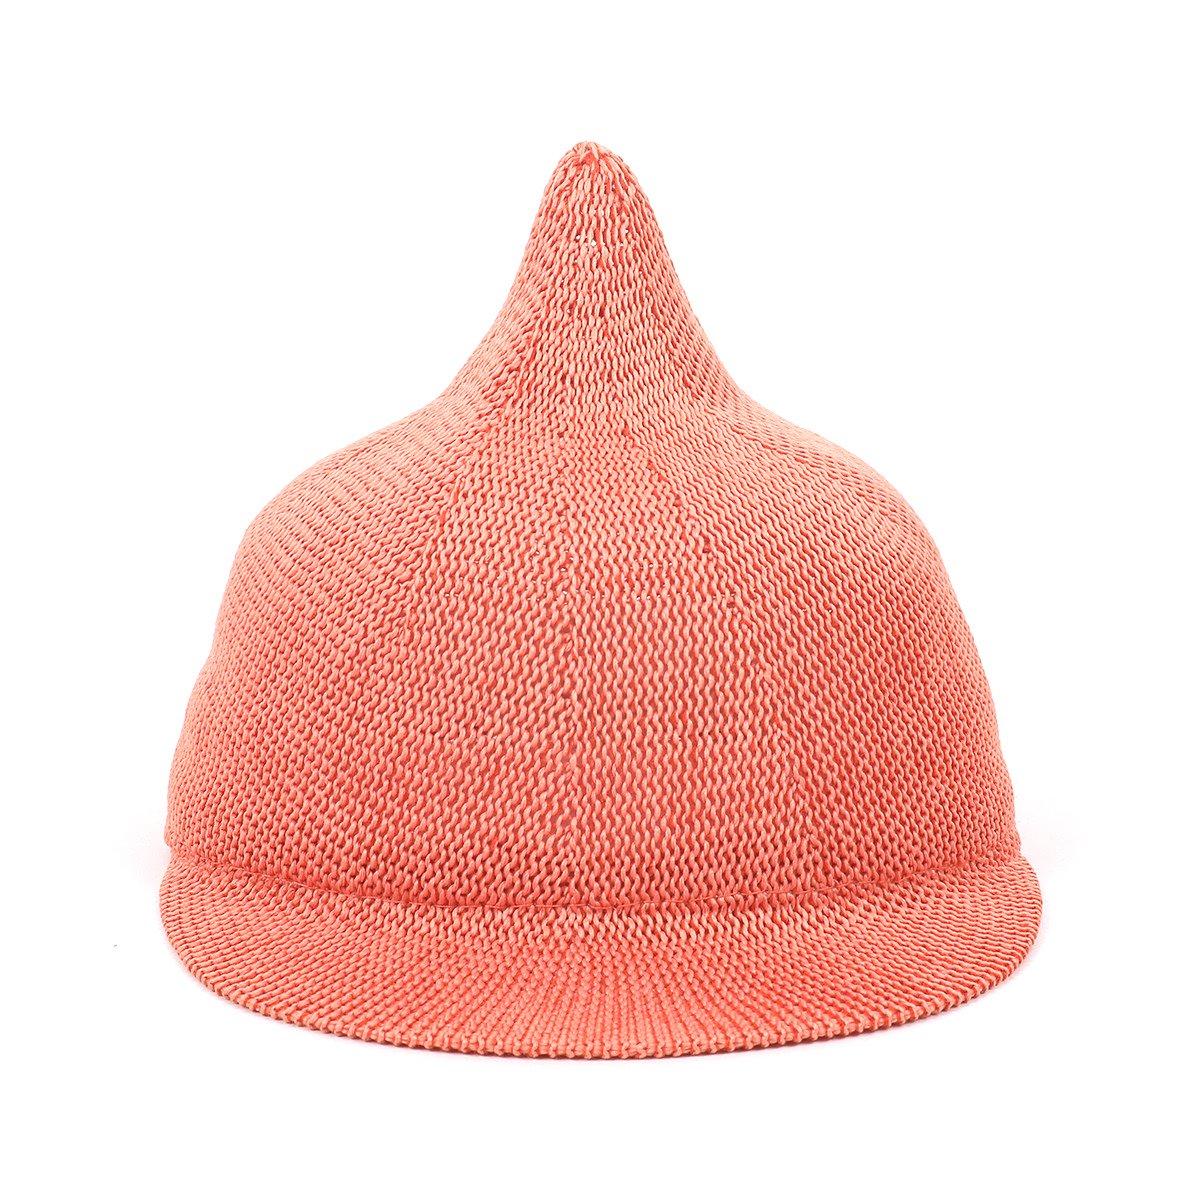 【BABY】Baby Tongari Thermo Cap 2 詳細画像3